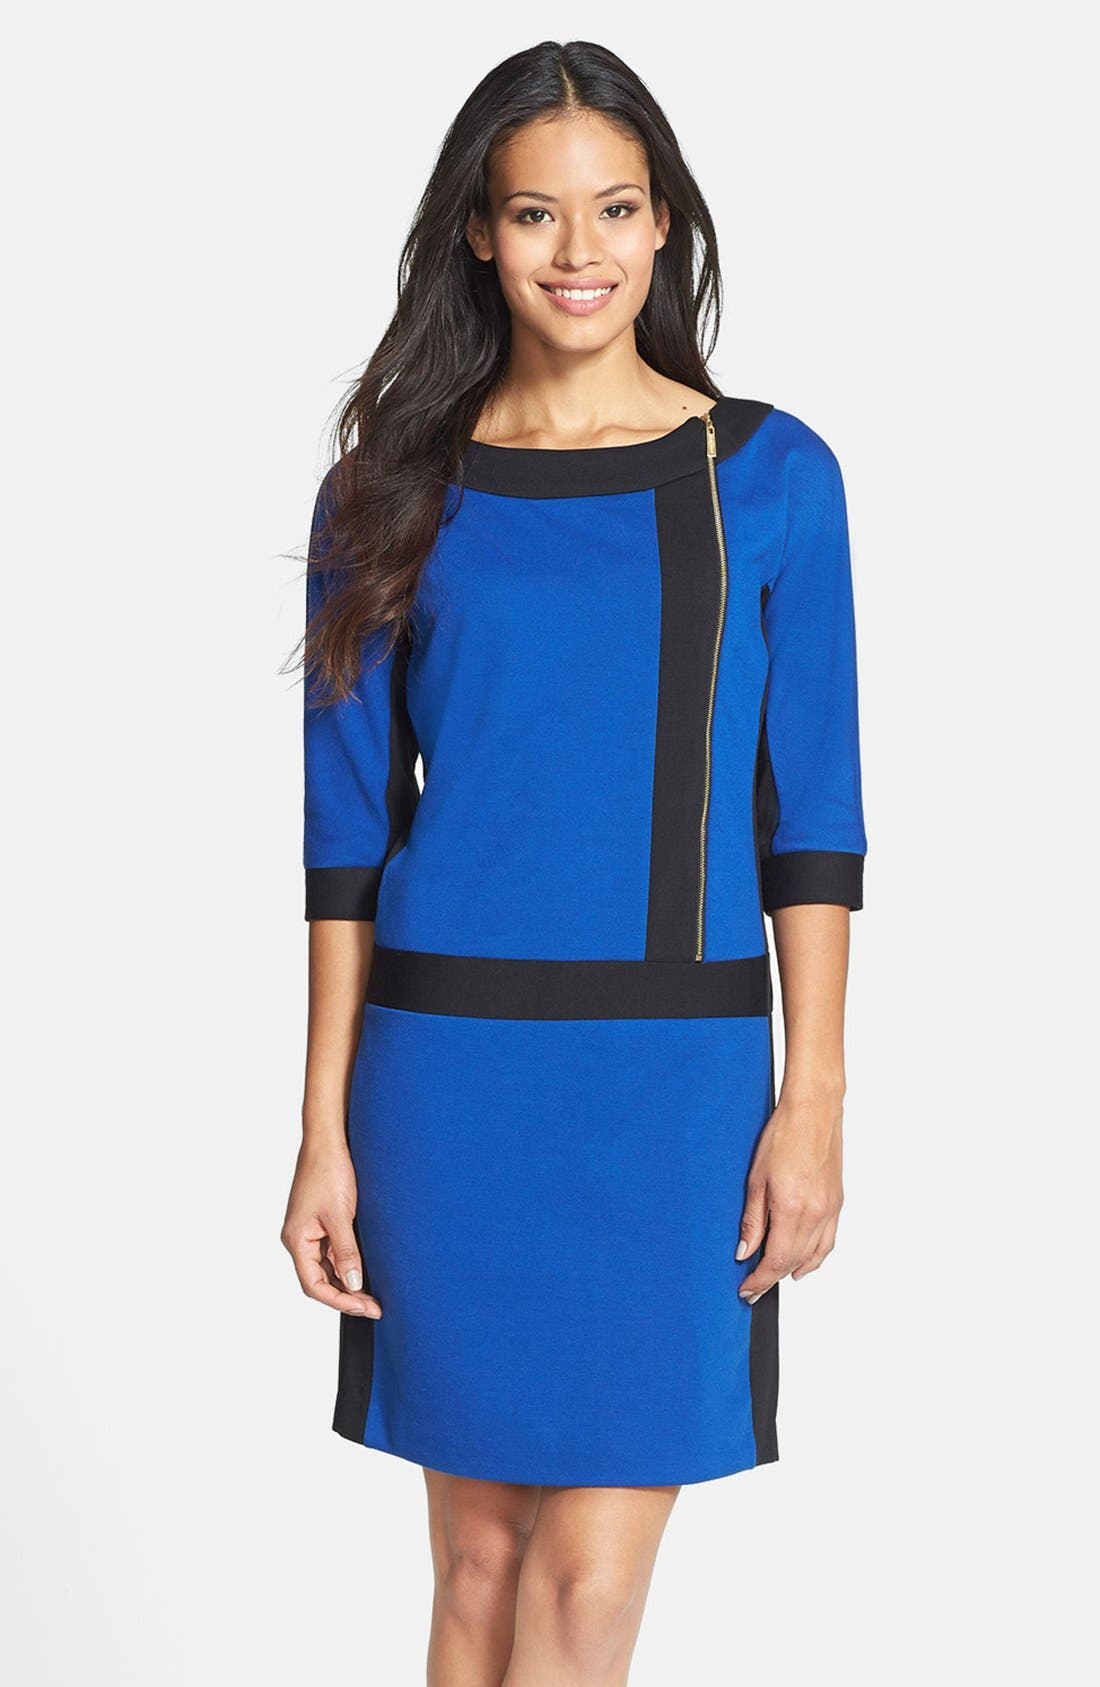 Alternate Image 1 Selected - Ellen Tracy Front Zip Colorblock Ponte Knit Shift Dress